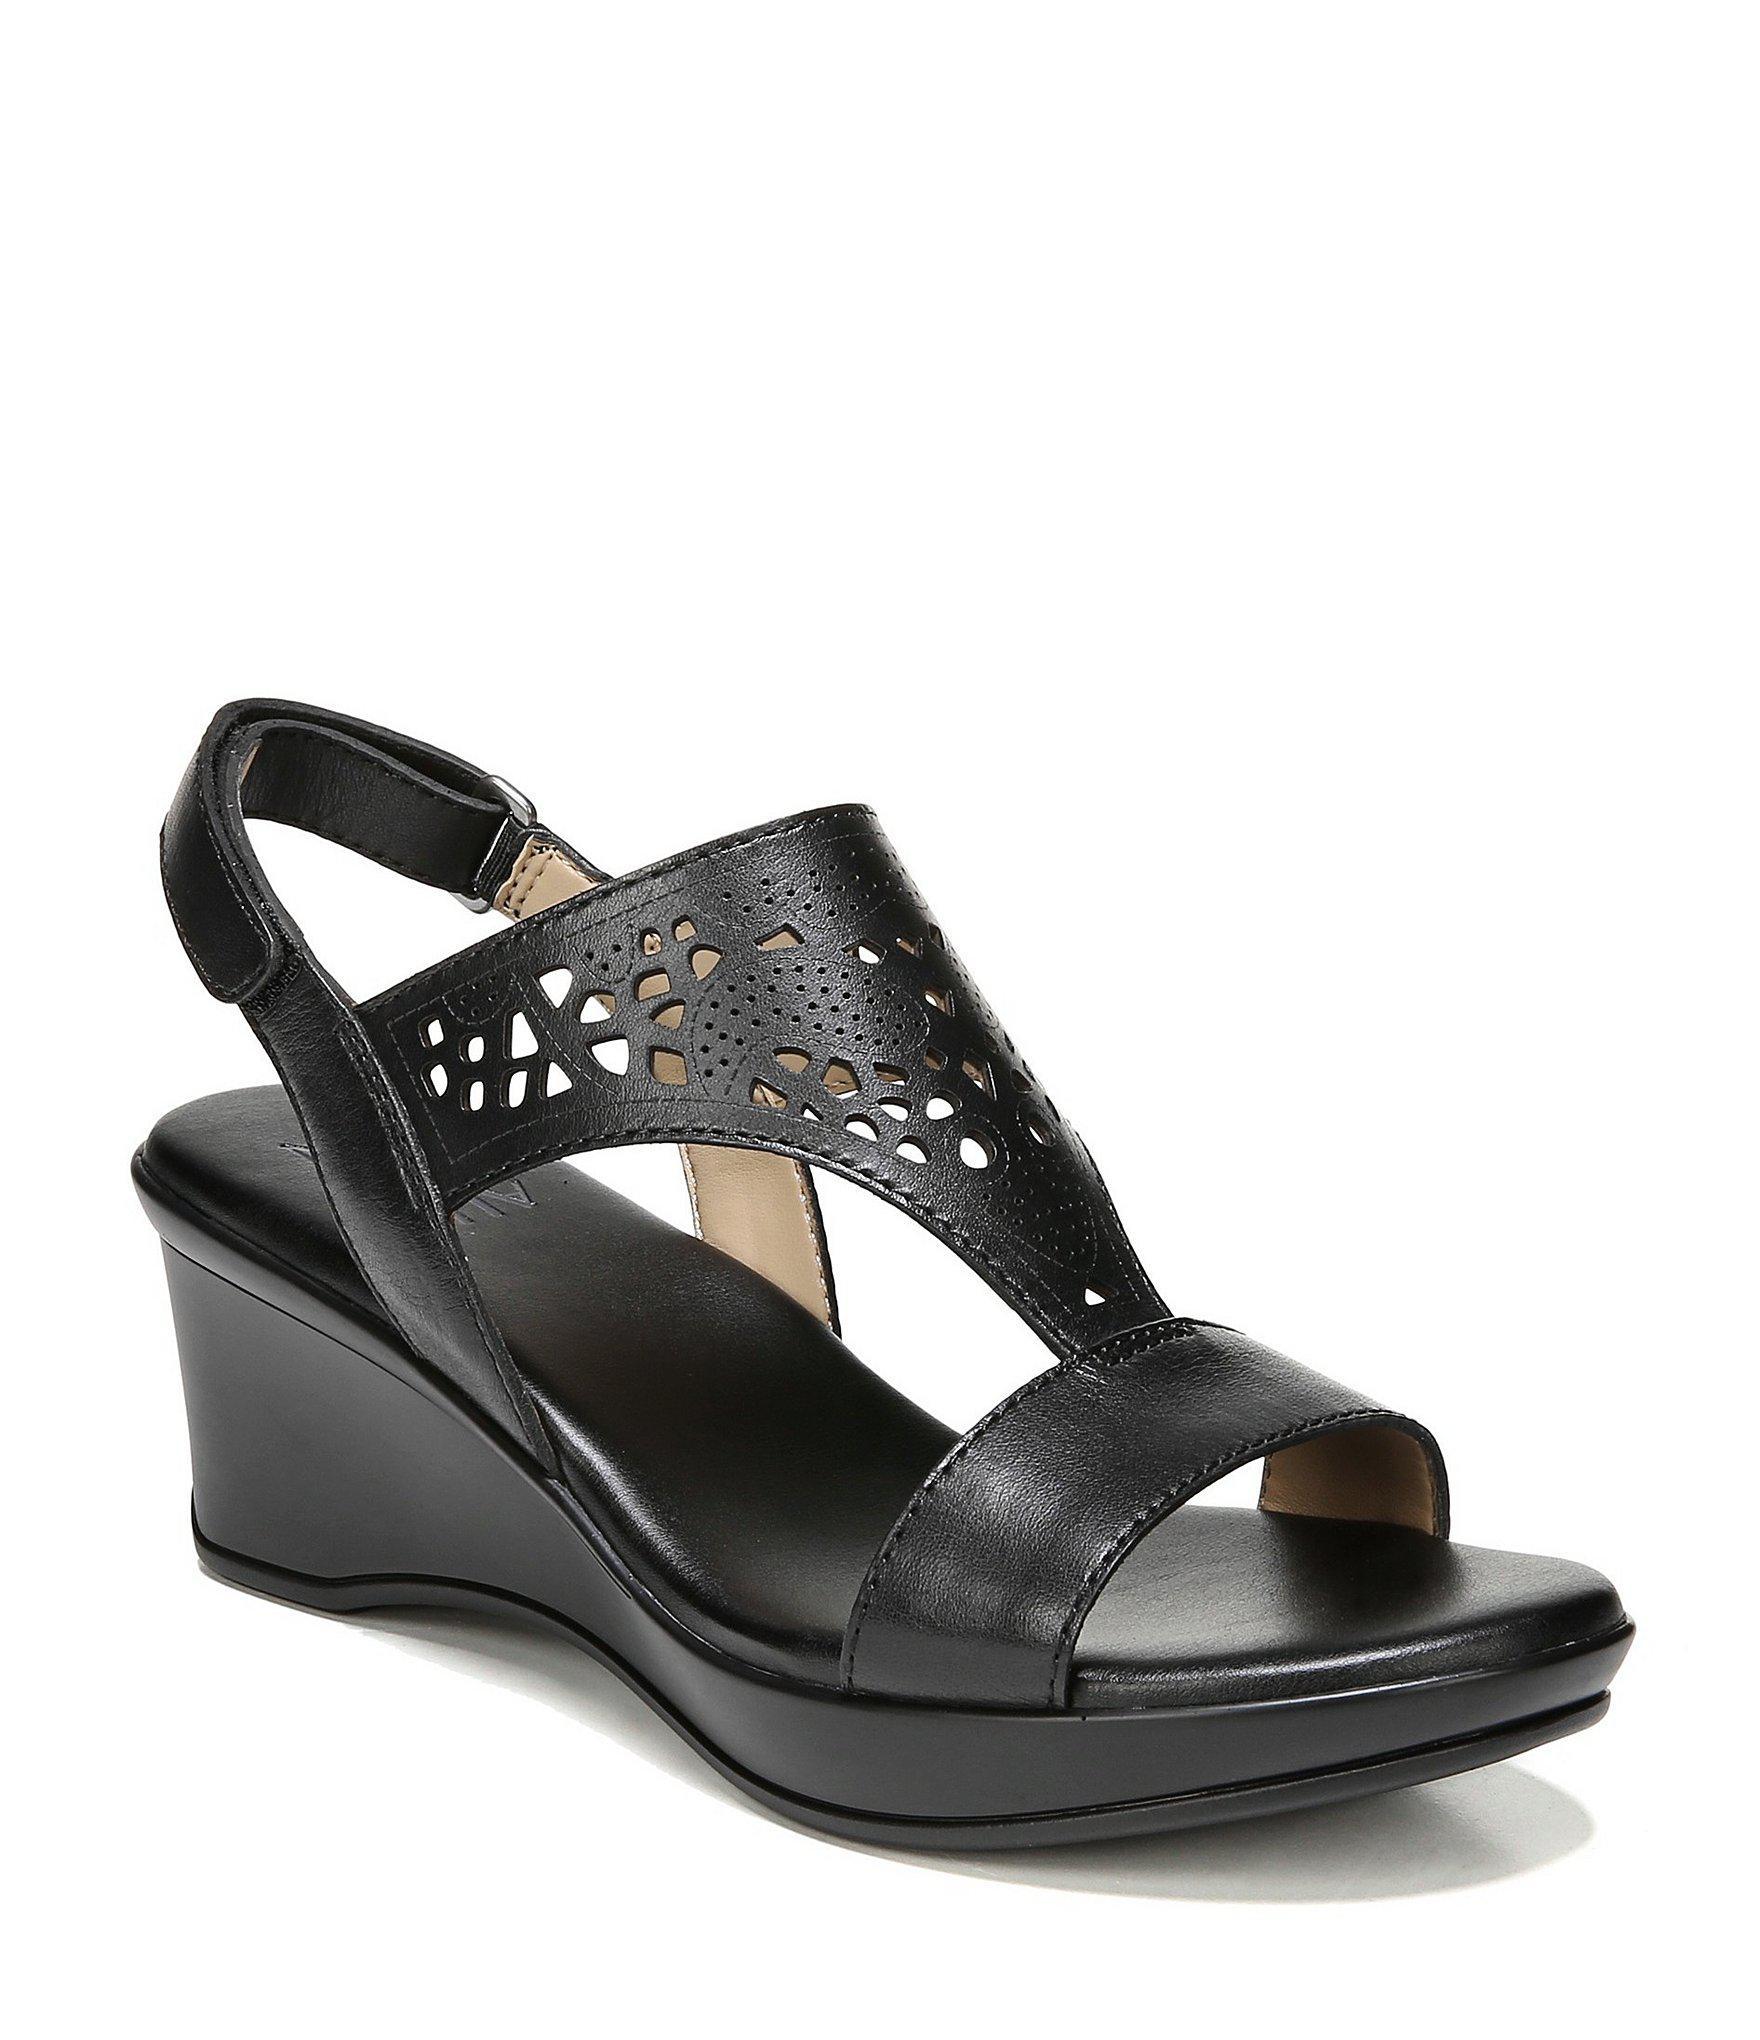 e16c6bd9a8f4 Lyst - Naturalizer Veda Wedge Sandals in Black